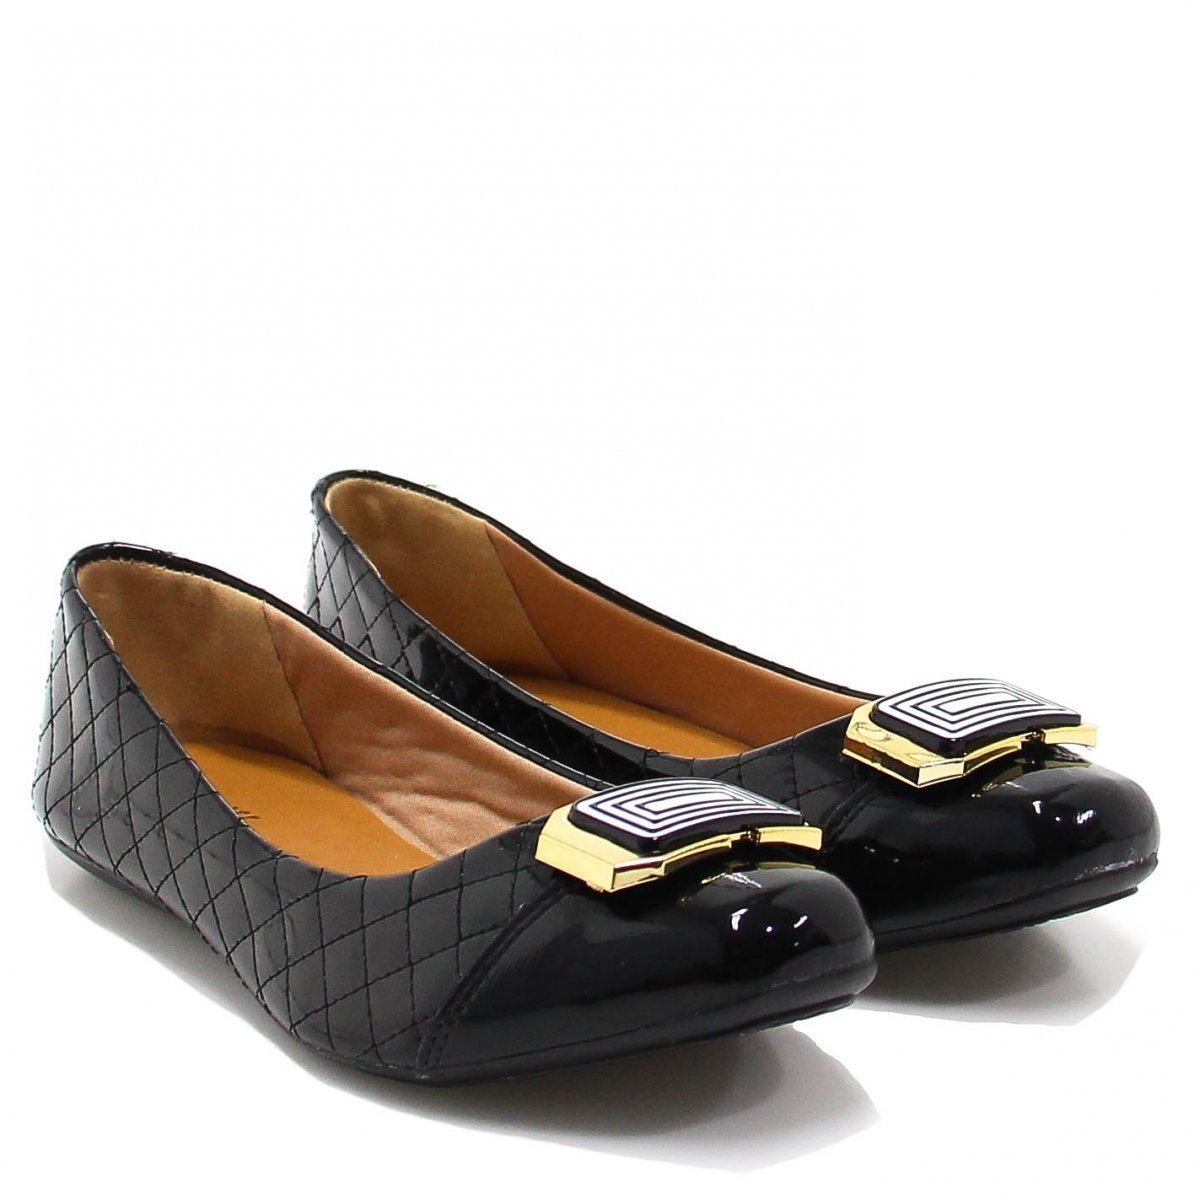 Zariff Sapatilha Sapatilha Metal Verniz Preto Verniz Zariff Shoes Shoes Iqq1tO